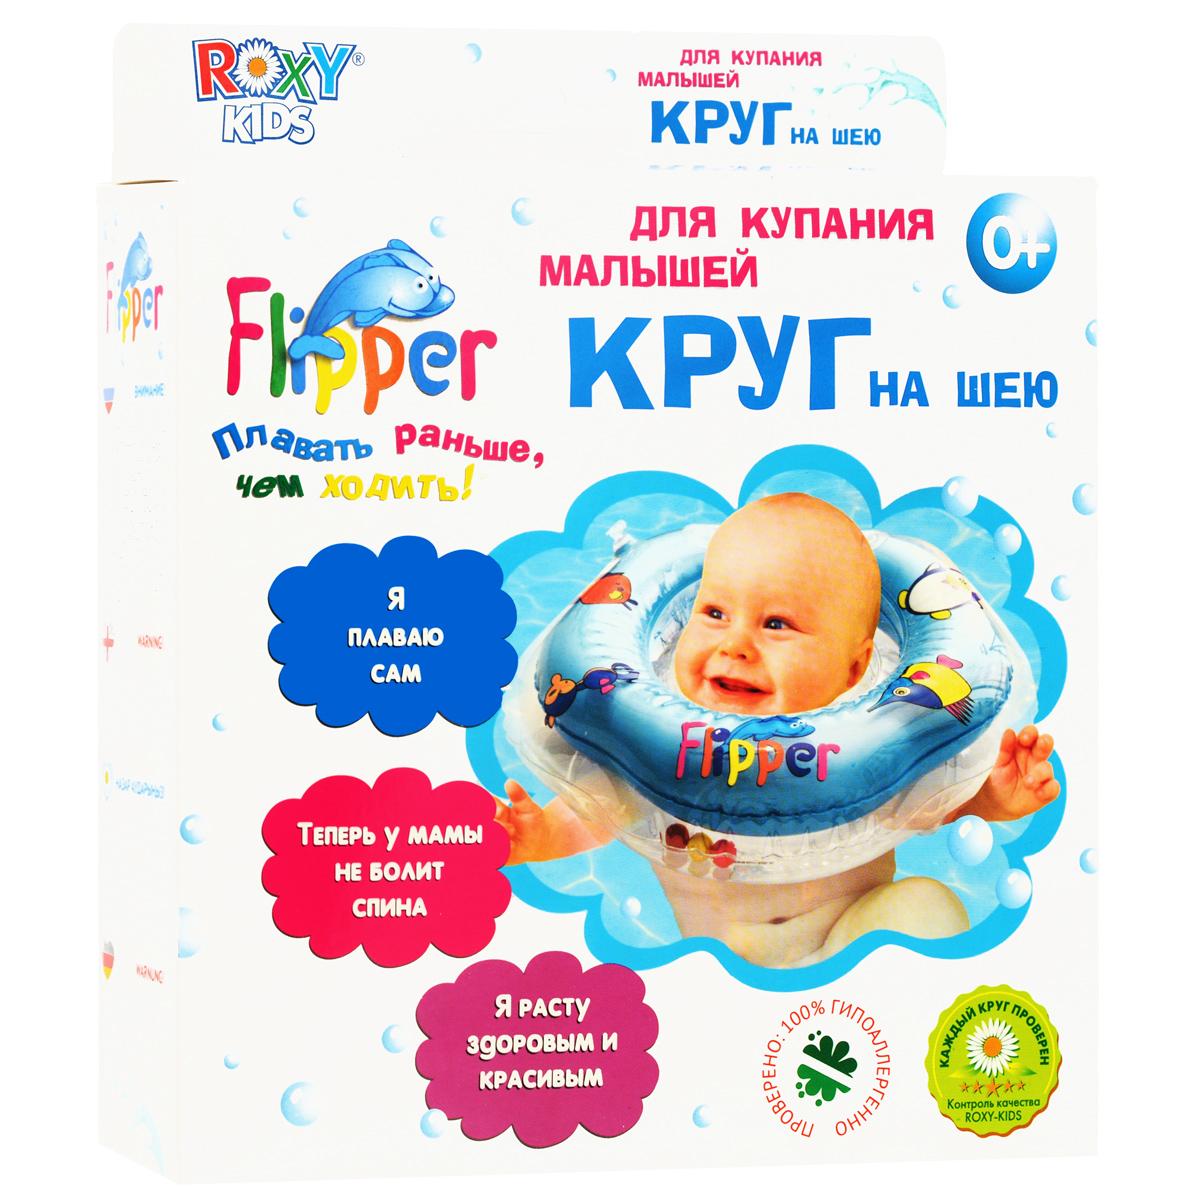 Круг на шею для купания Roxy-Kids  Flipper , цвет: голубой -  Круги для купания